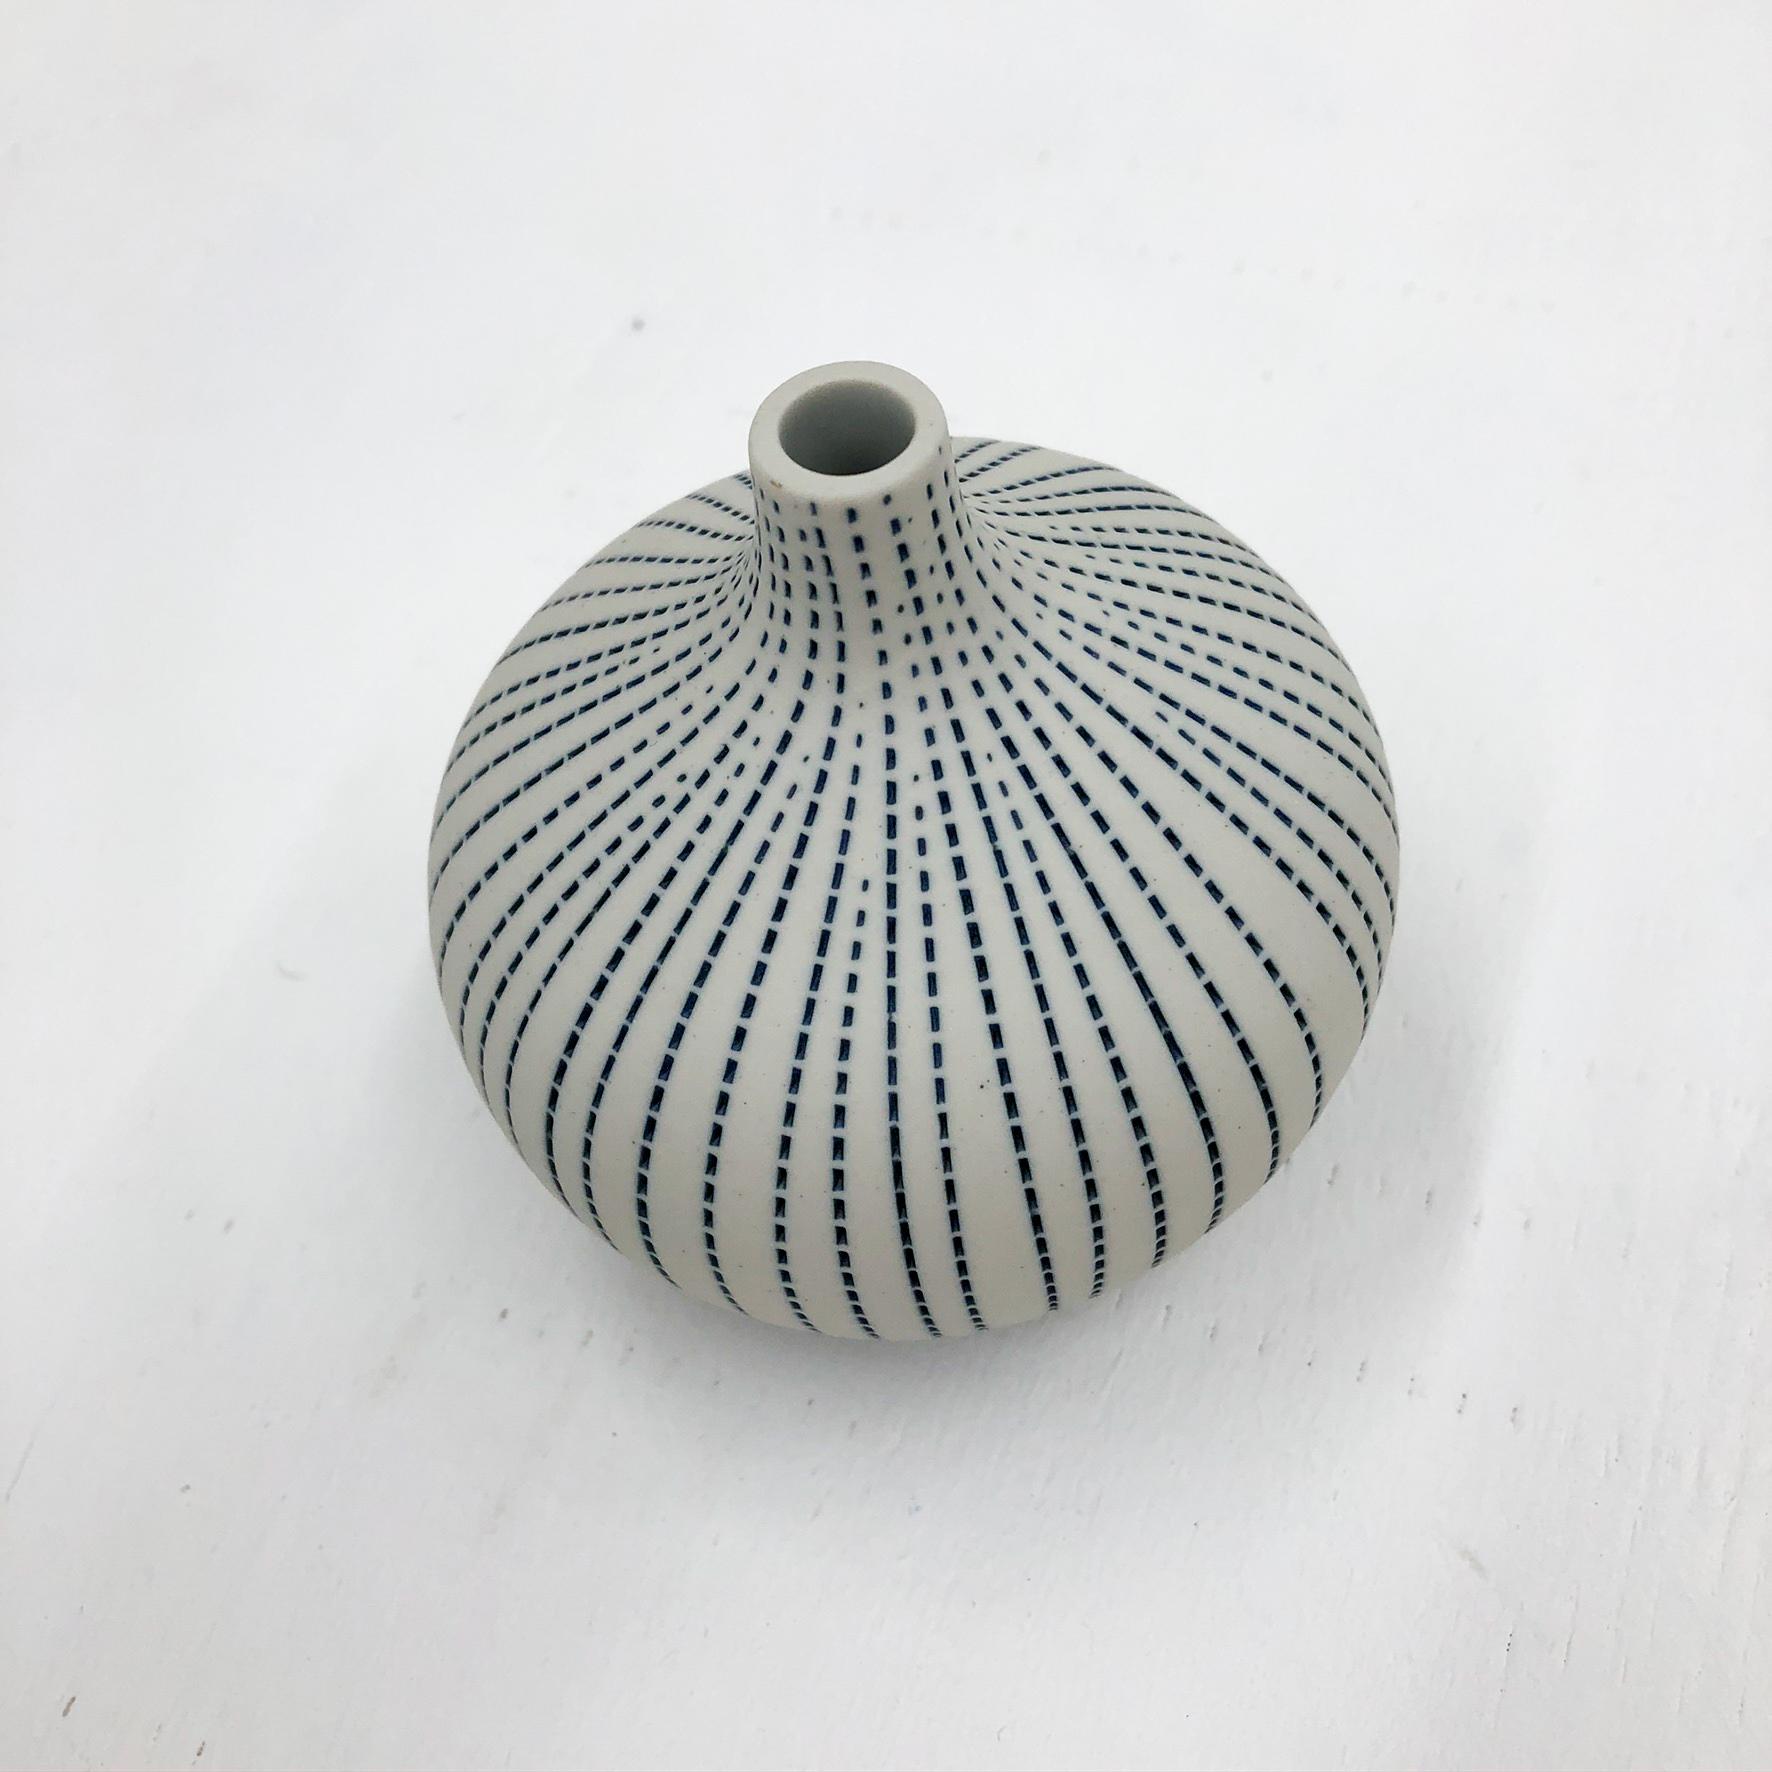 Congo Tiny L Handmade Vase - White & Blue Dots